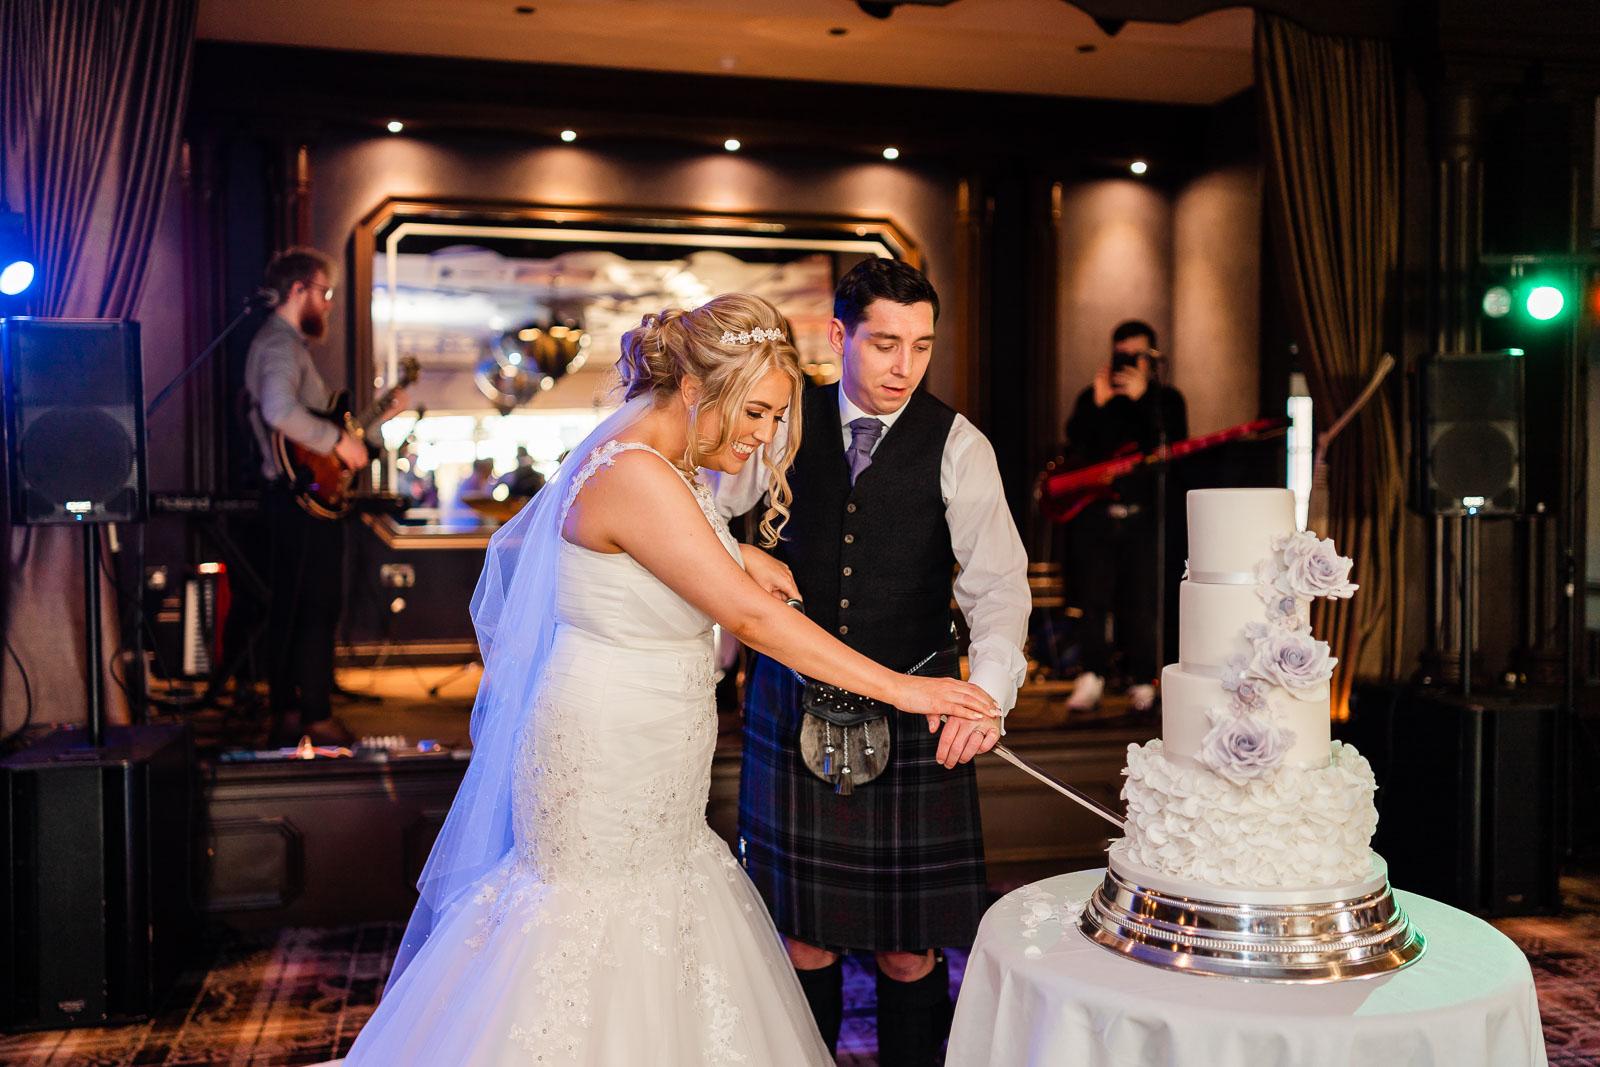 cornhill_castle_wedding_biggar_dearlyphotography (357 of 448).jpg